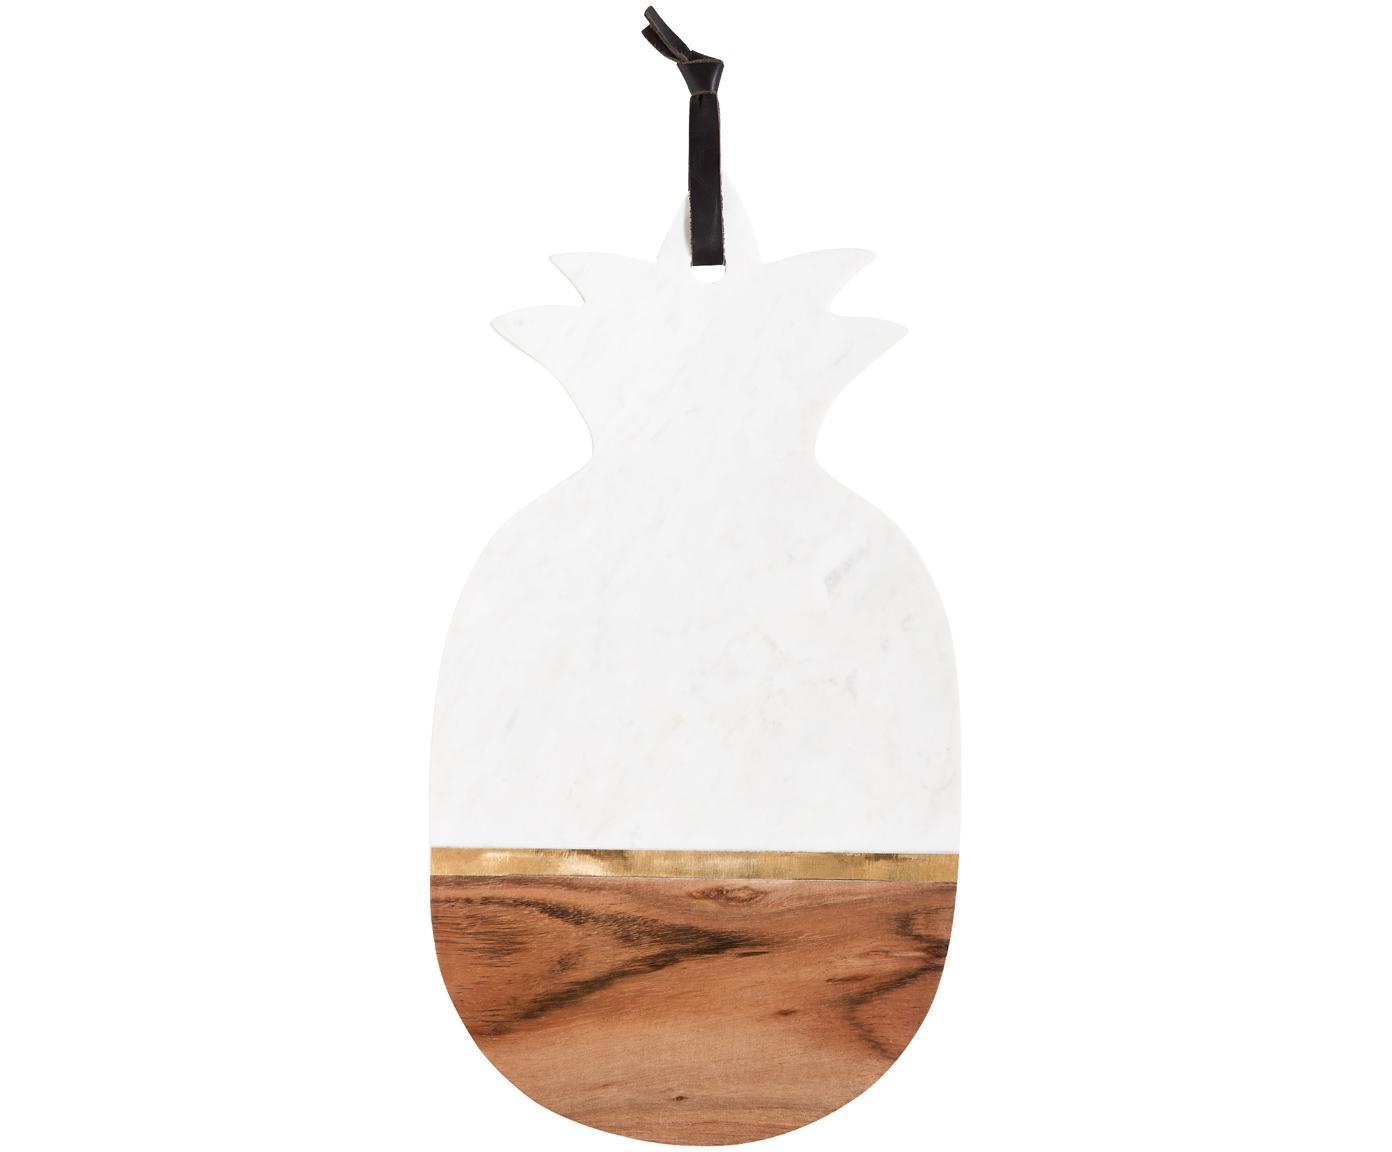 Marmor-Schneidebrett Luxory Kitchen, Marmor, Akazienholz, Messing, Weiß, Akazienholz, Messing, 20 x 40 cm